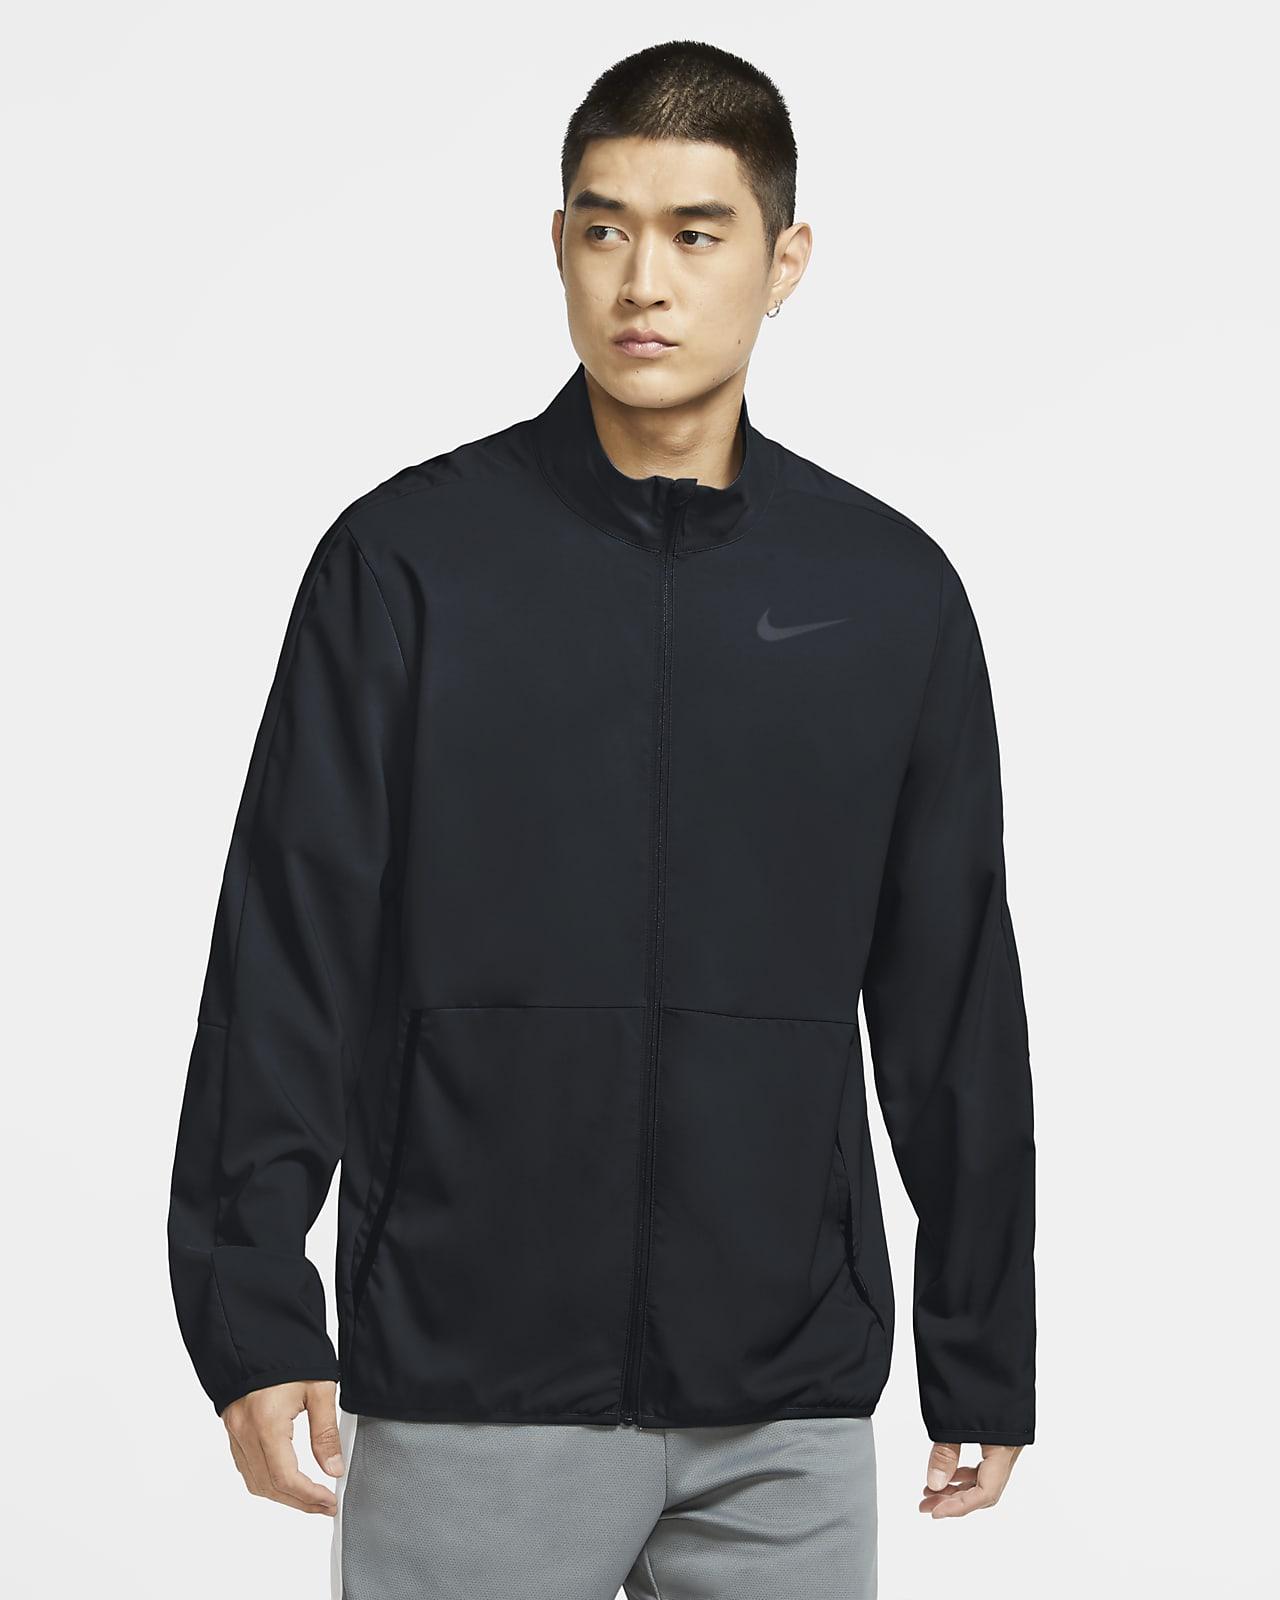 Мужская куртка из тканого материала для тренинга Nike Dri-FIT